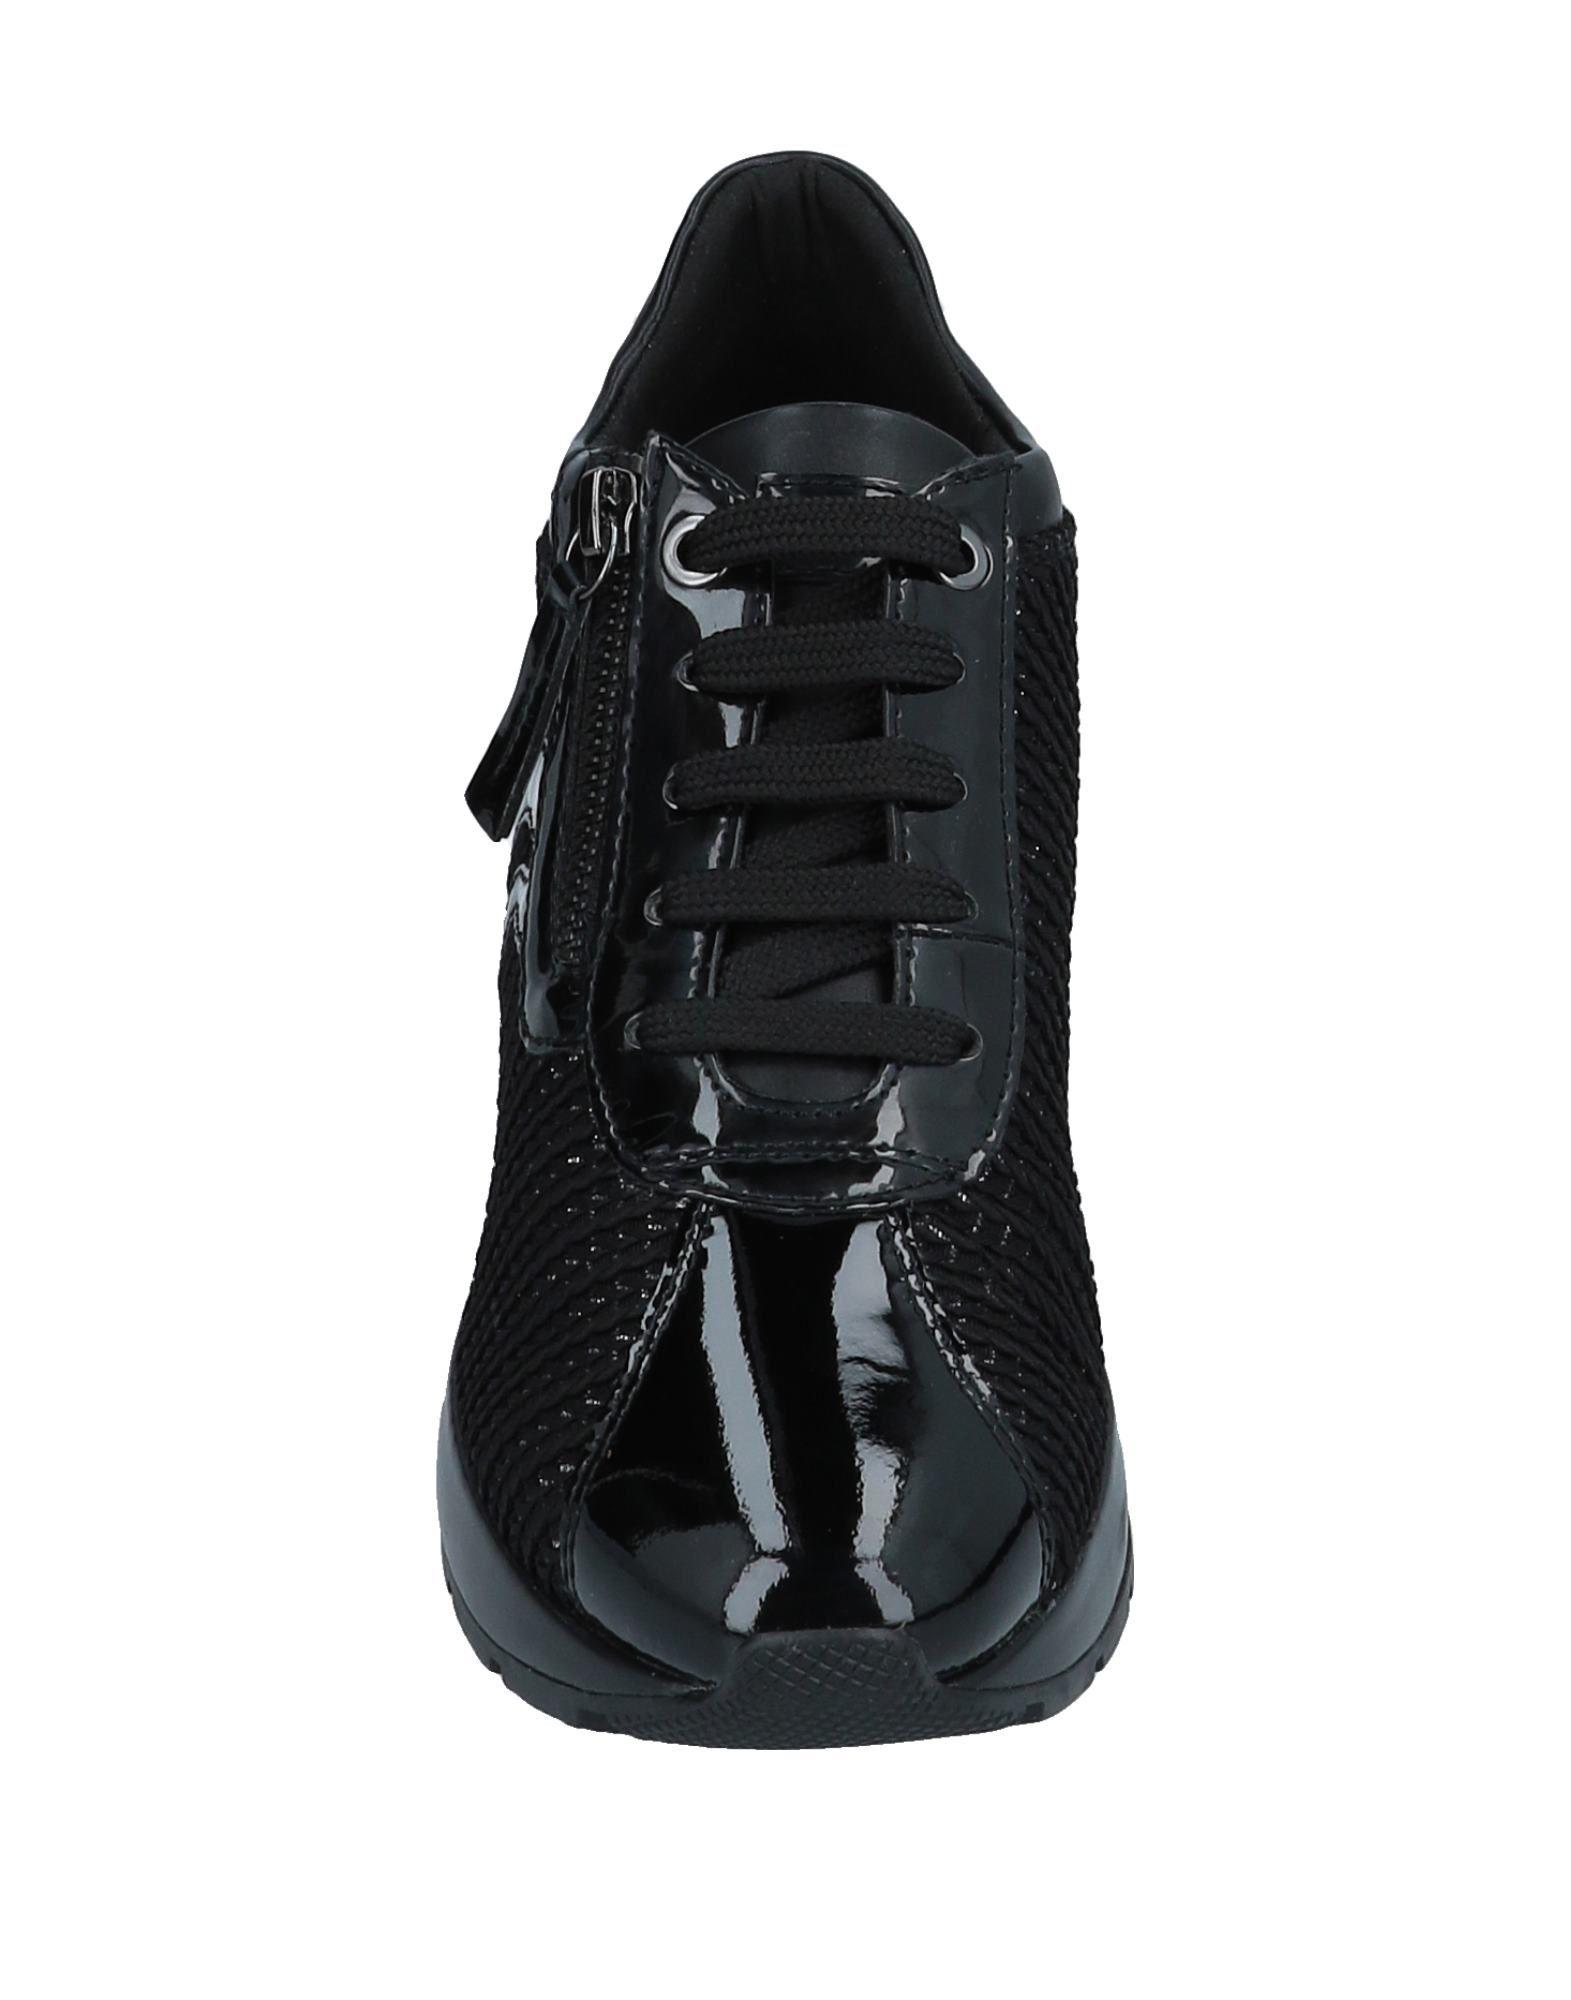 Stilvolle Schuhe billige Schuhe Stilvolle Geox Turnschuhes Damen 11564651FU 8aad5a